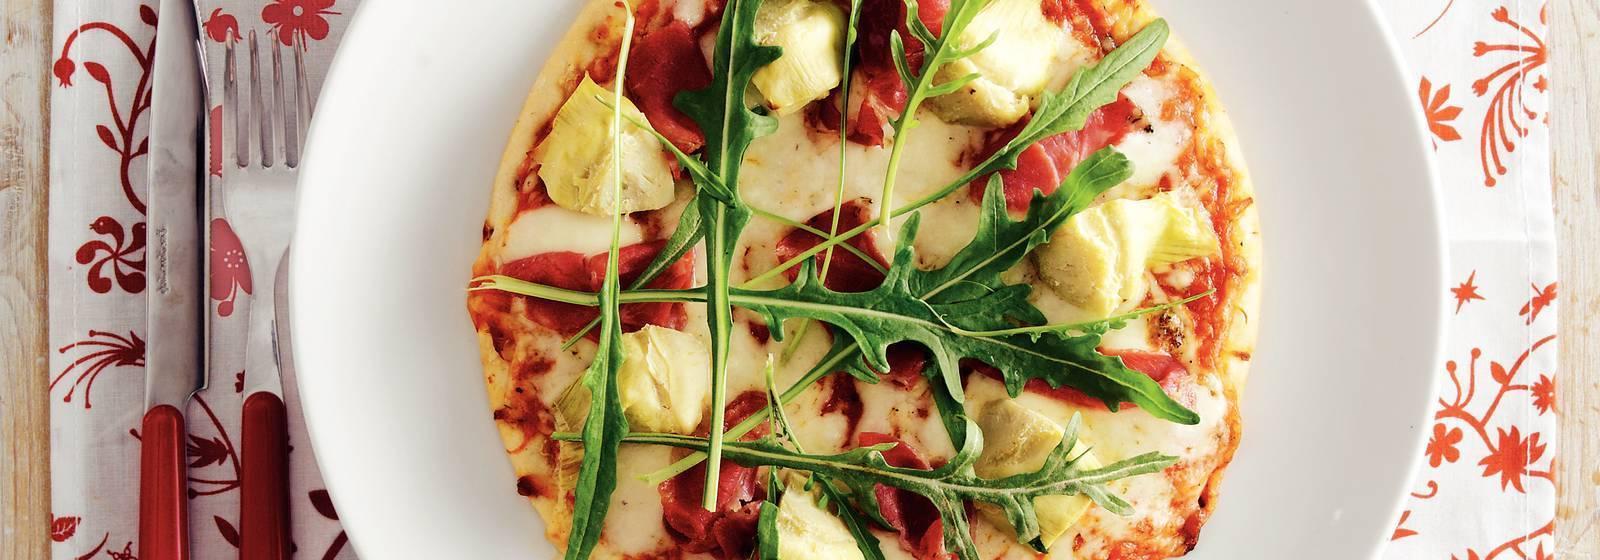 Pizza with ham and artichoke